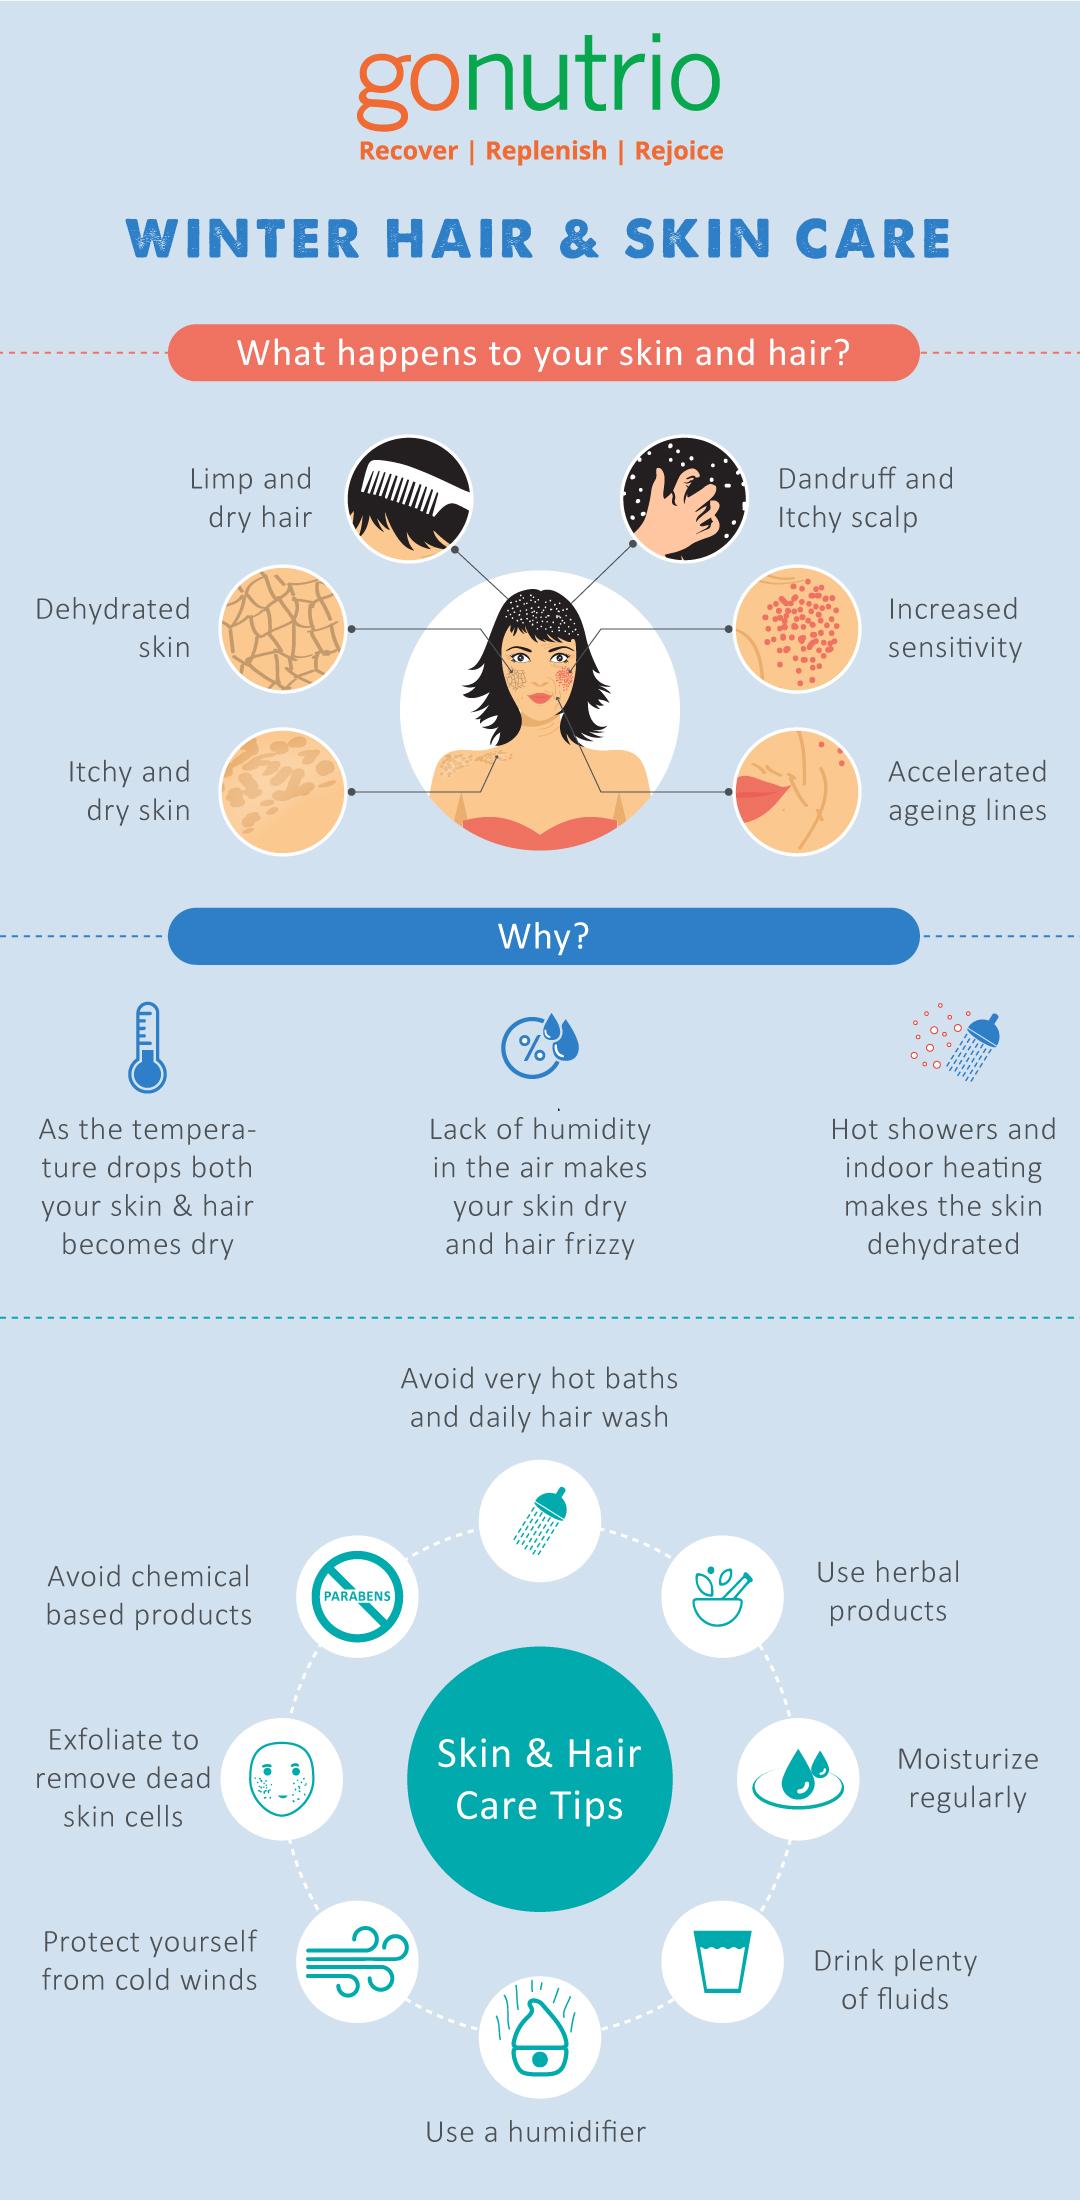 Winter-Skin-Care-infographic_2.jpg